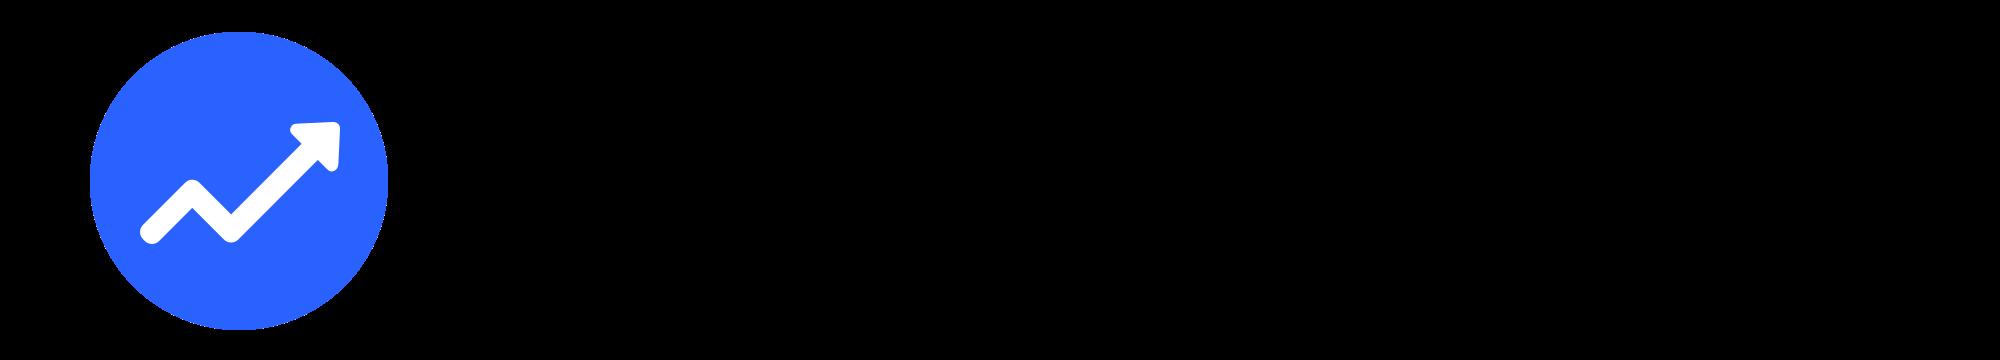 serpmarker-logo-dark